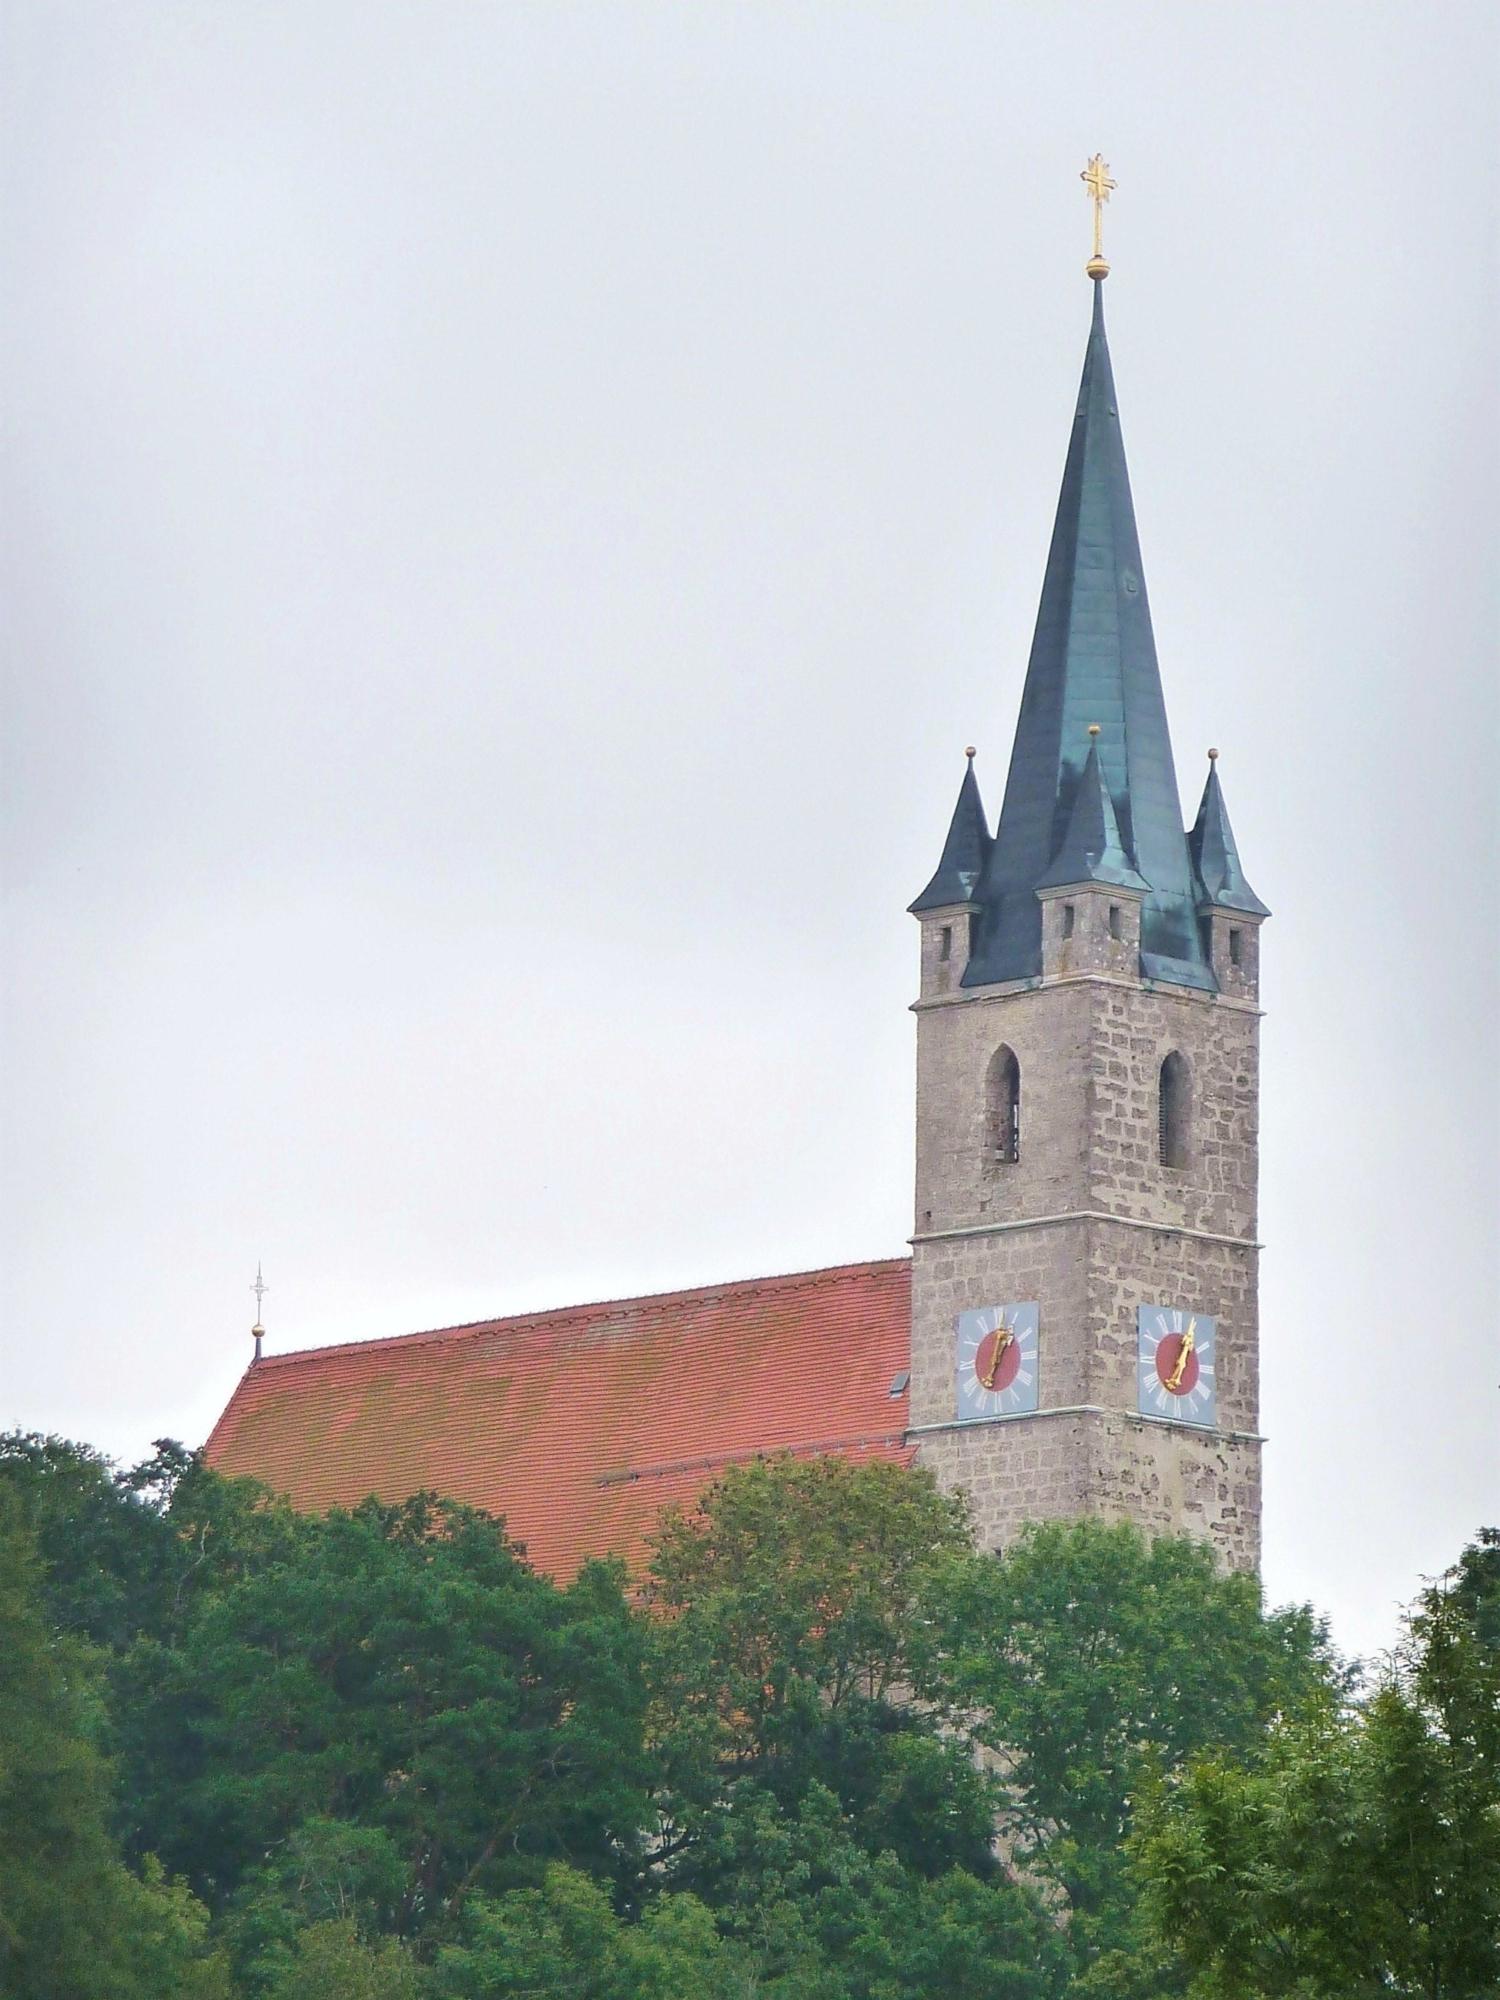 Pfarrkirche St Rupertus2 C Burgkirchen am Wald